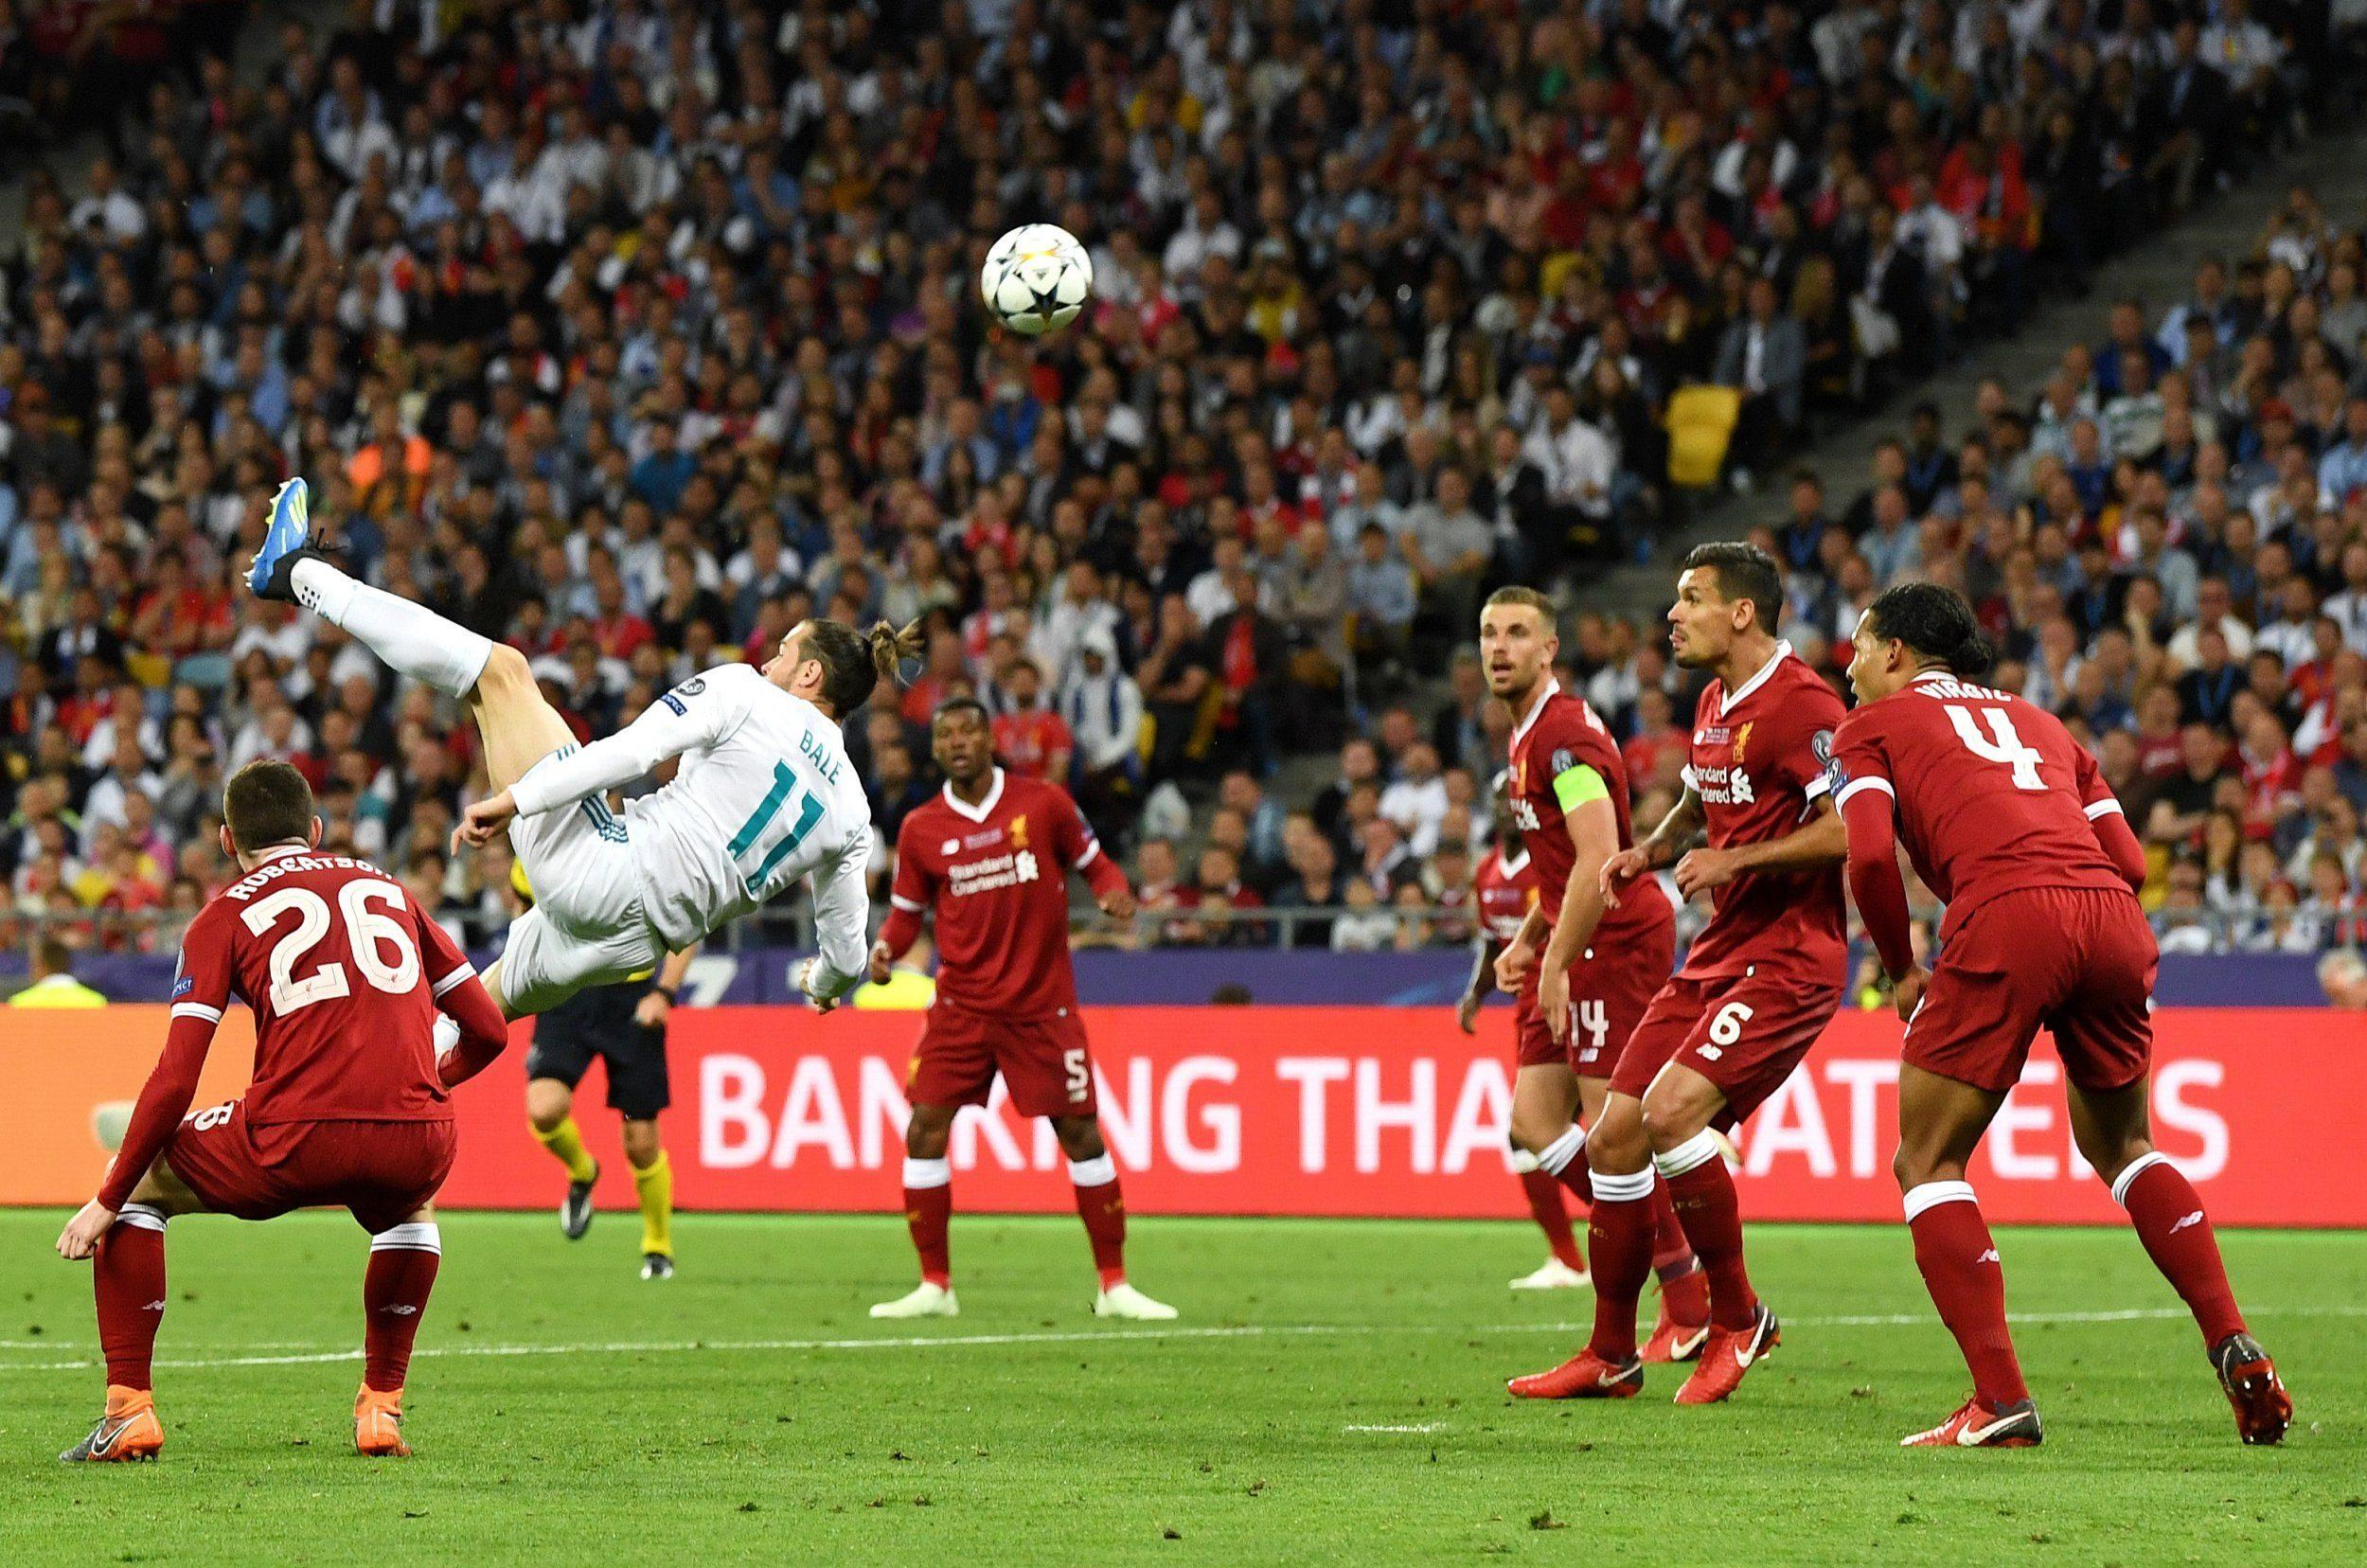 Gareth Bale deciding between Manchester United and Bayern Munich transfer offers